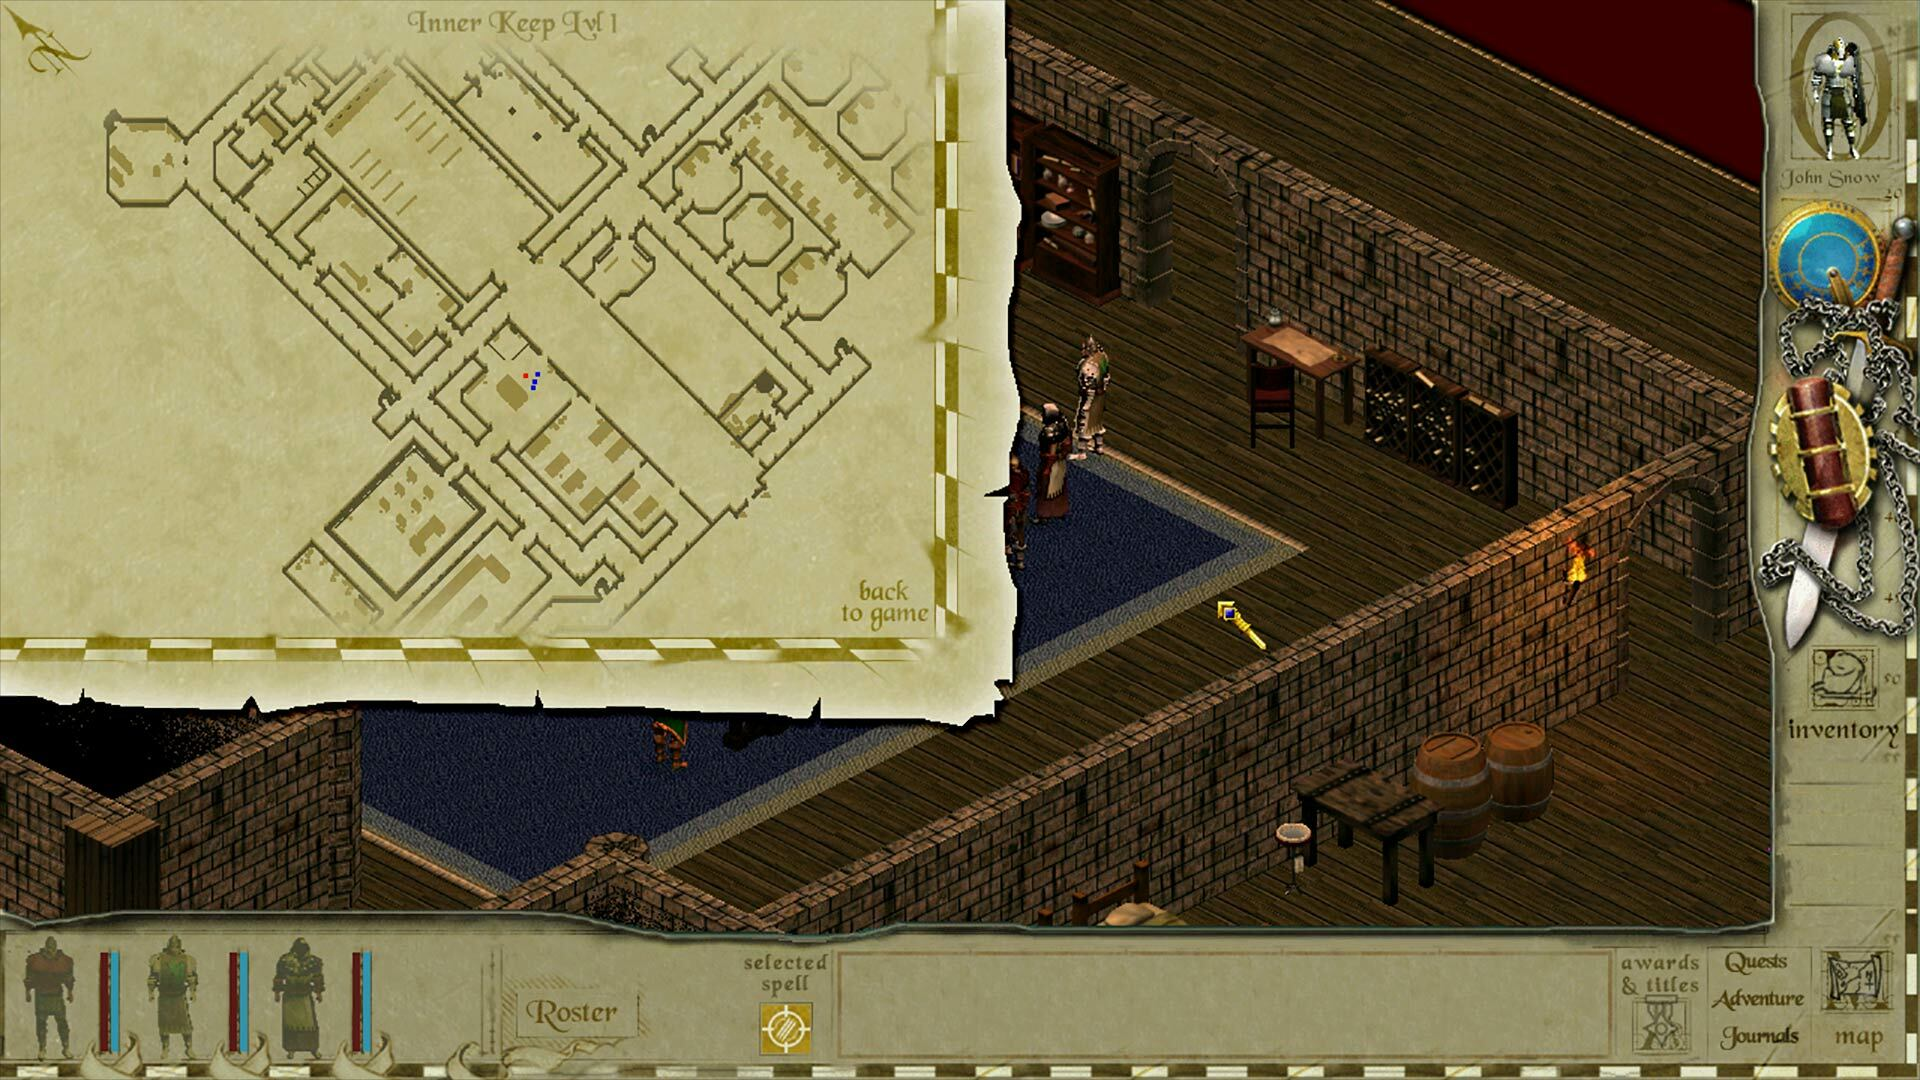 siege-of-avalon-anthology-pc-screenshot-3